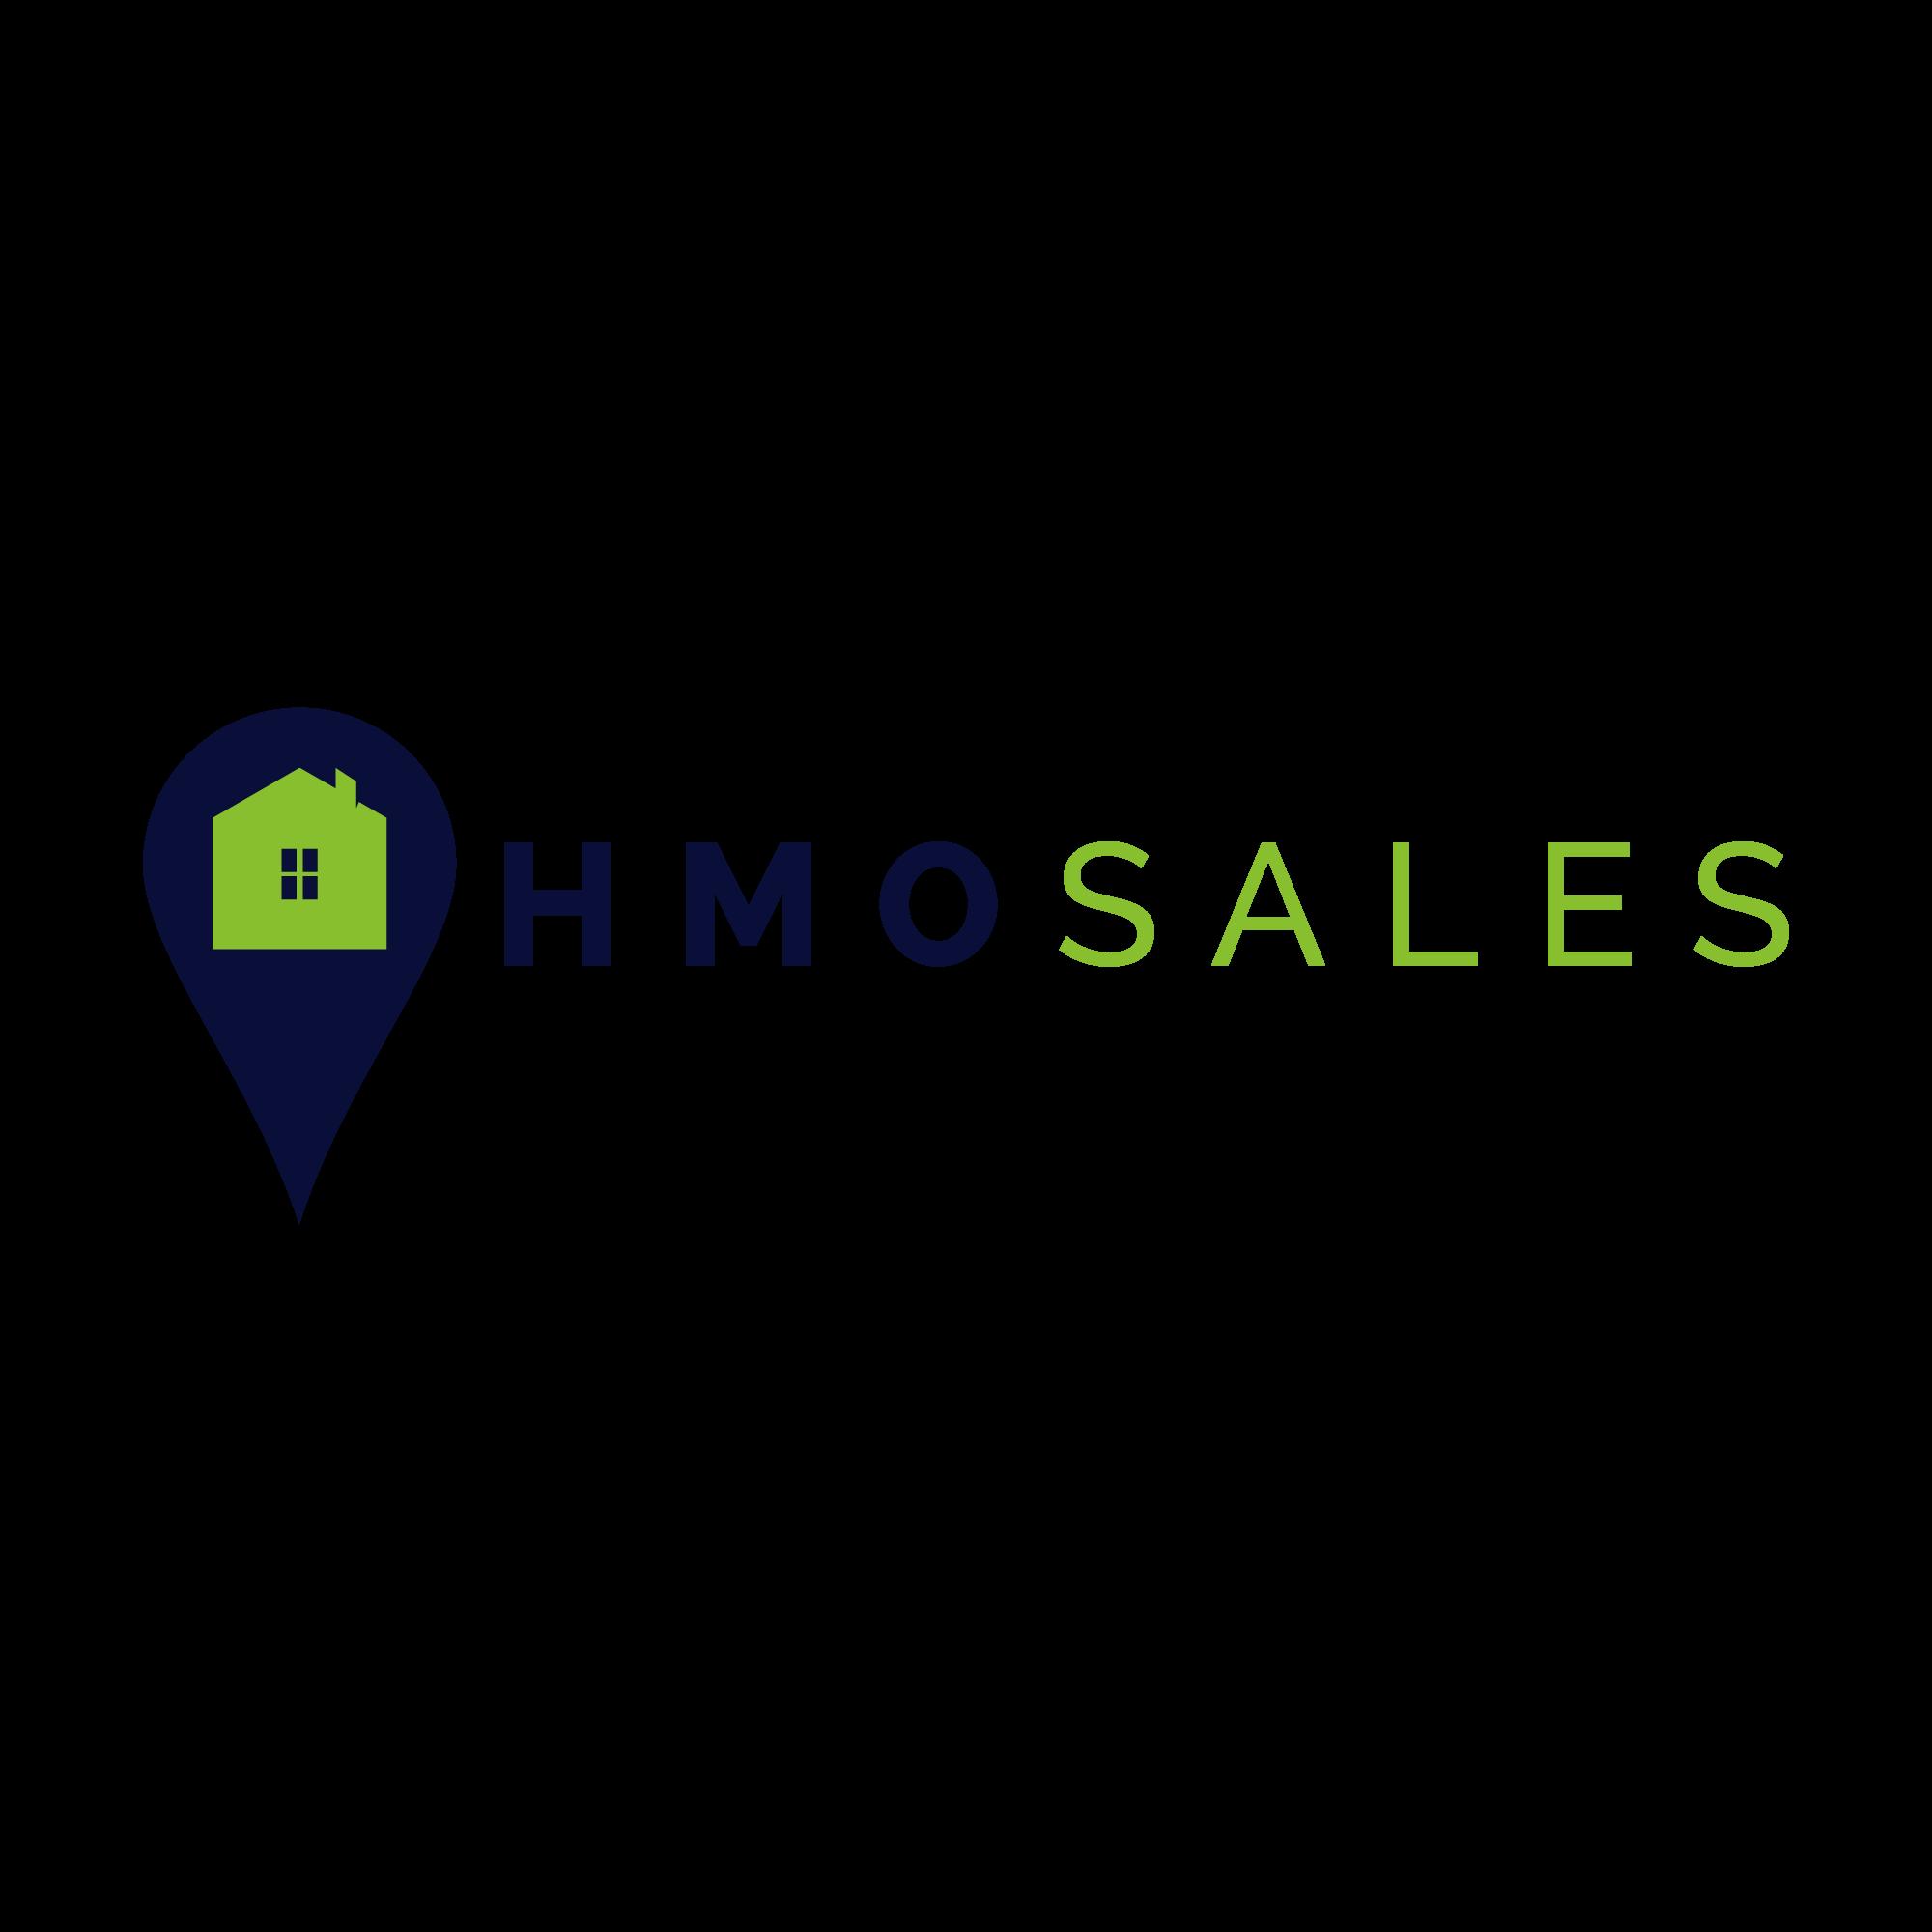 HMOsales-Logo-A3